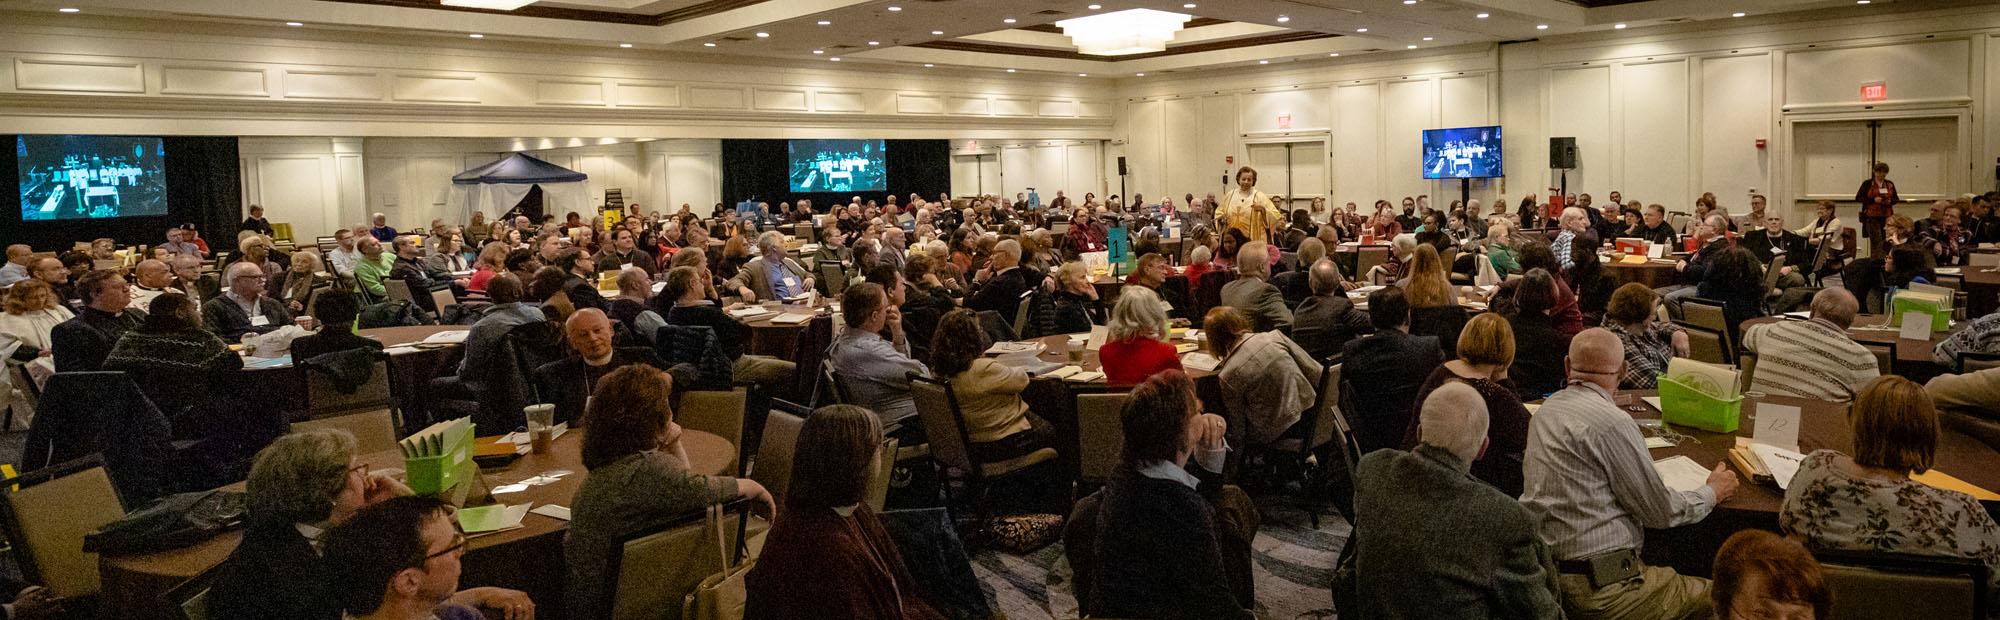 The 2019 Convention. CYNTHIA L. BLACK PHOTO